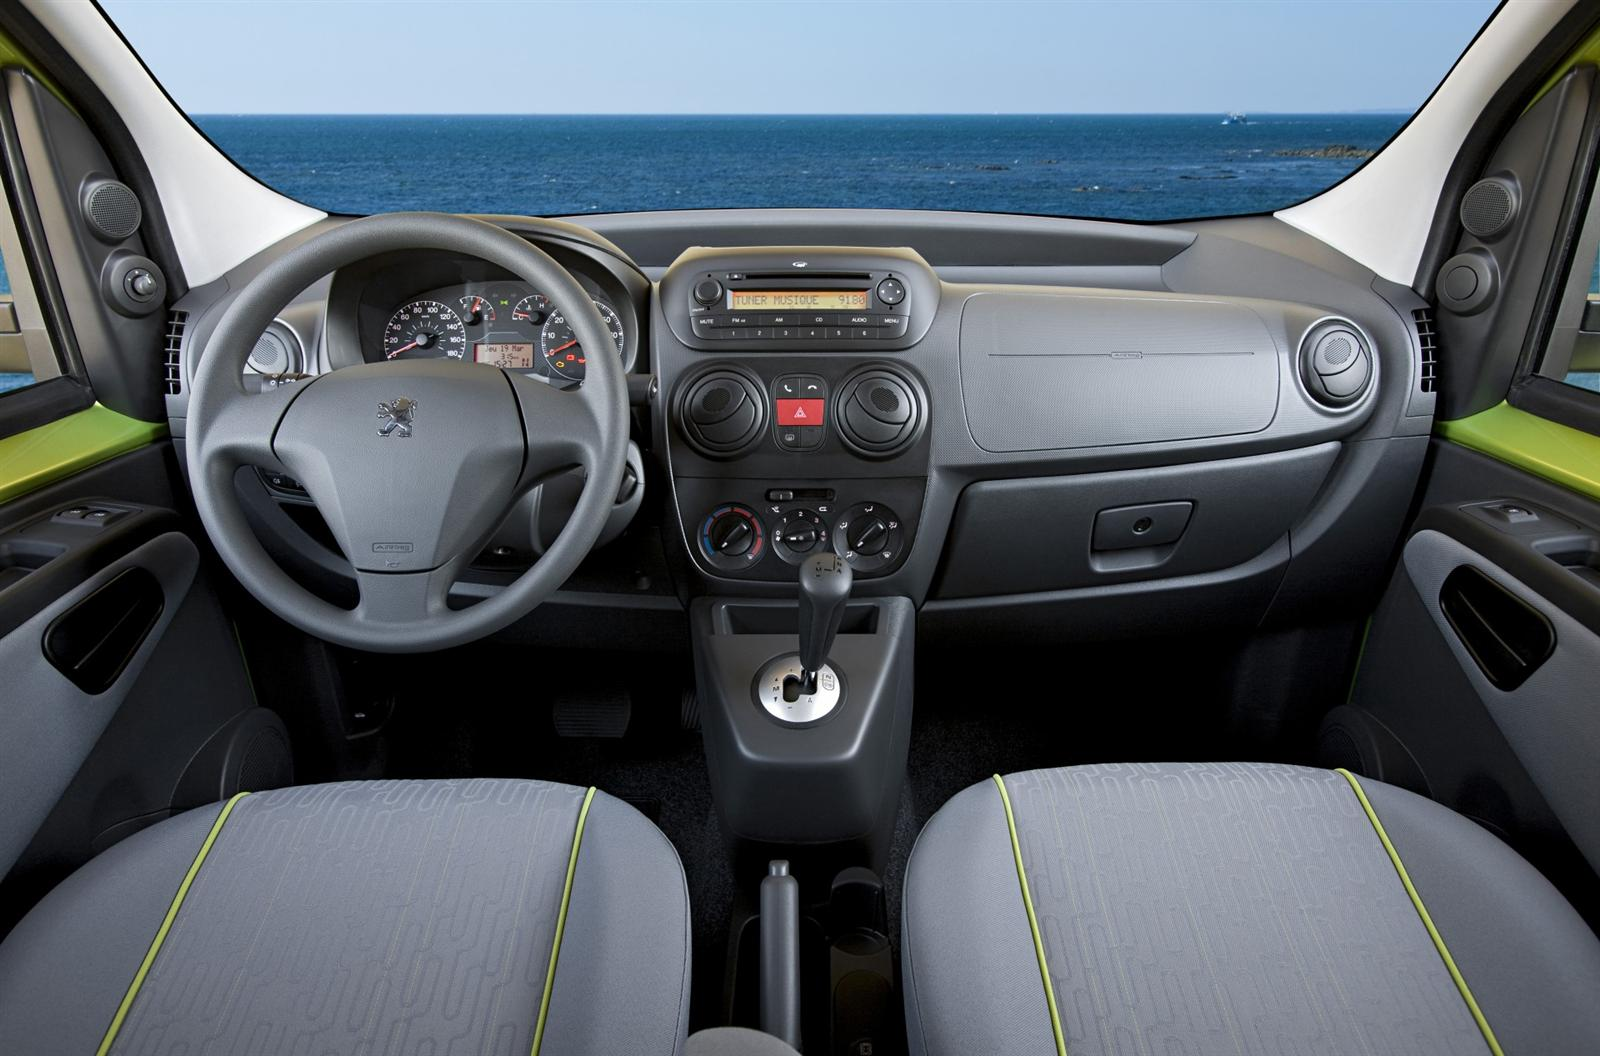 2011 Peugeot Bipper Tepee Image